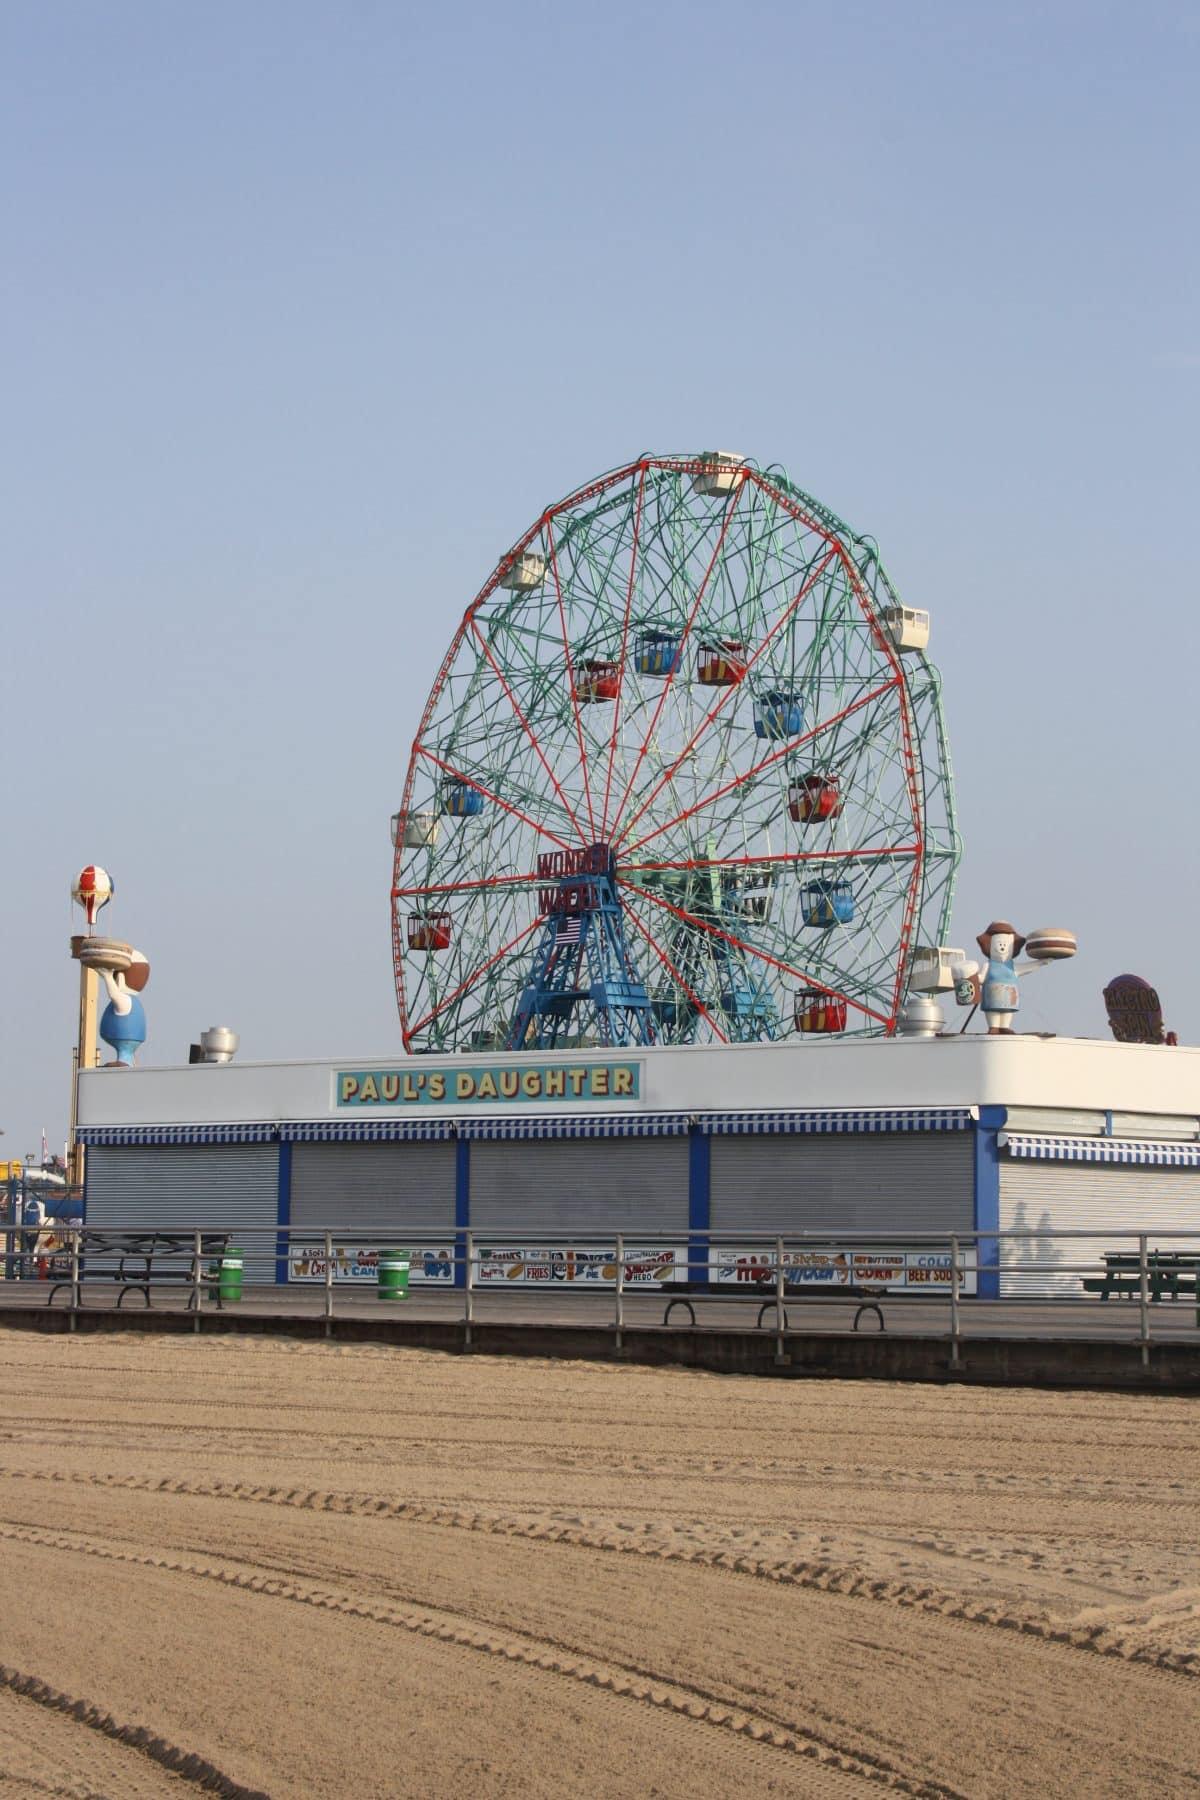 5 Tage New York Insider Tipps: Coney Island